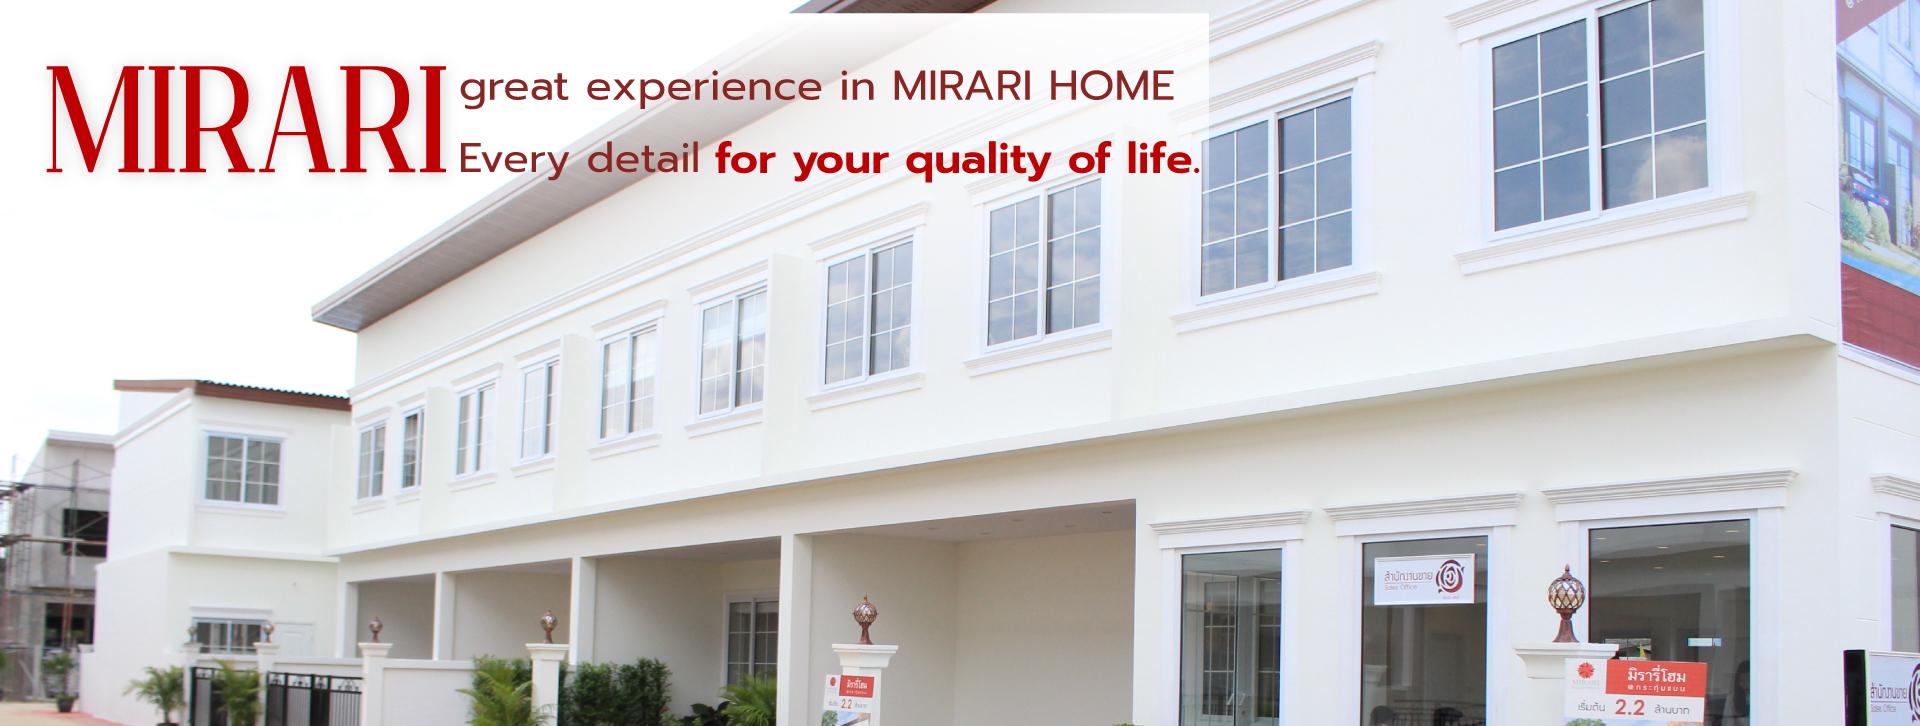 Mirari-Home_Banner-01_EDIT-10-AugEN